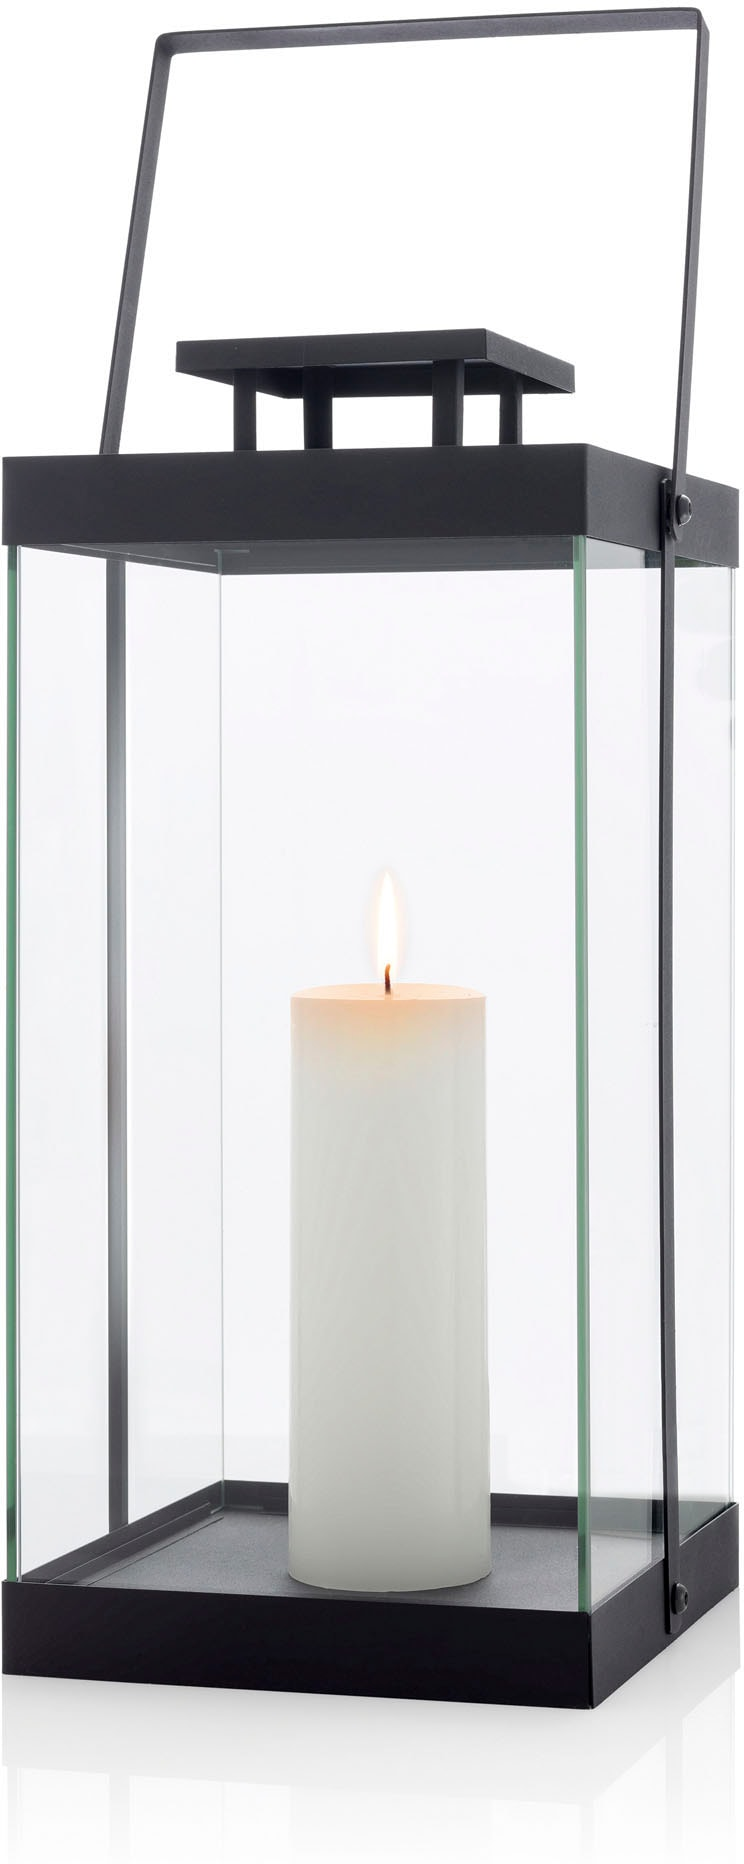 BLOMUS Kerzenlaterne Laterne -FINCA- groß - black schwarz Kerzenhalter Kerzen Laternen Wohnaccessoires